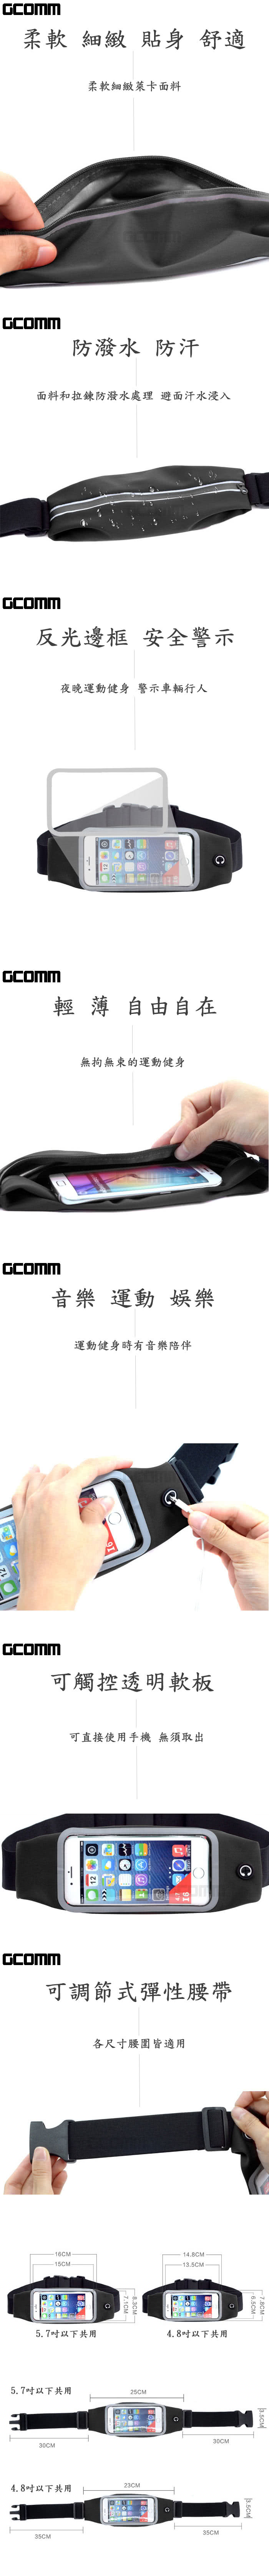 waist_bag_DM_700x5700.jpg?t=1491791587565